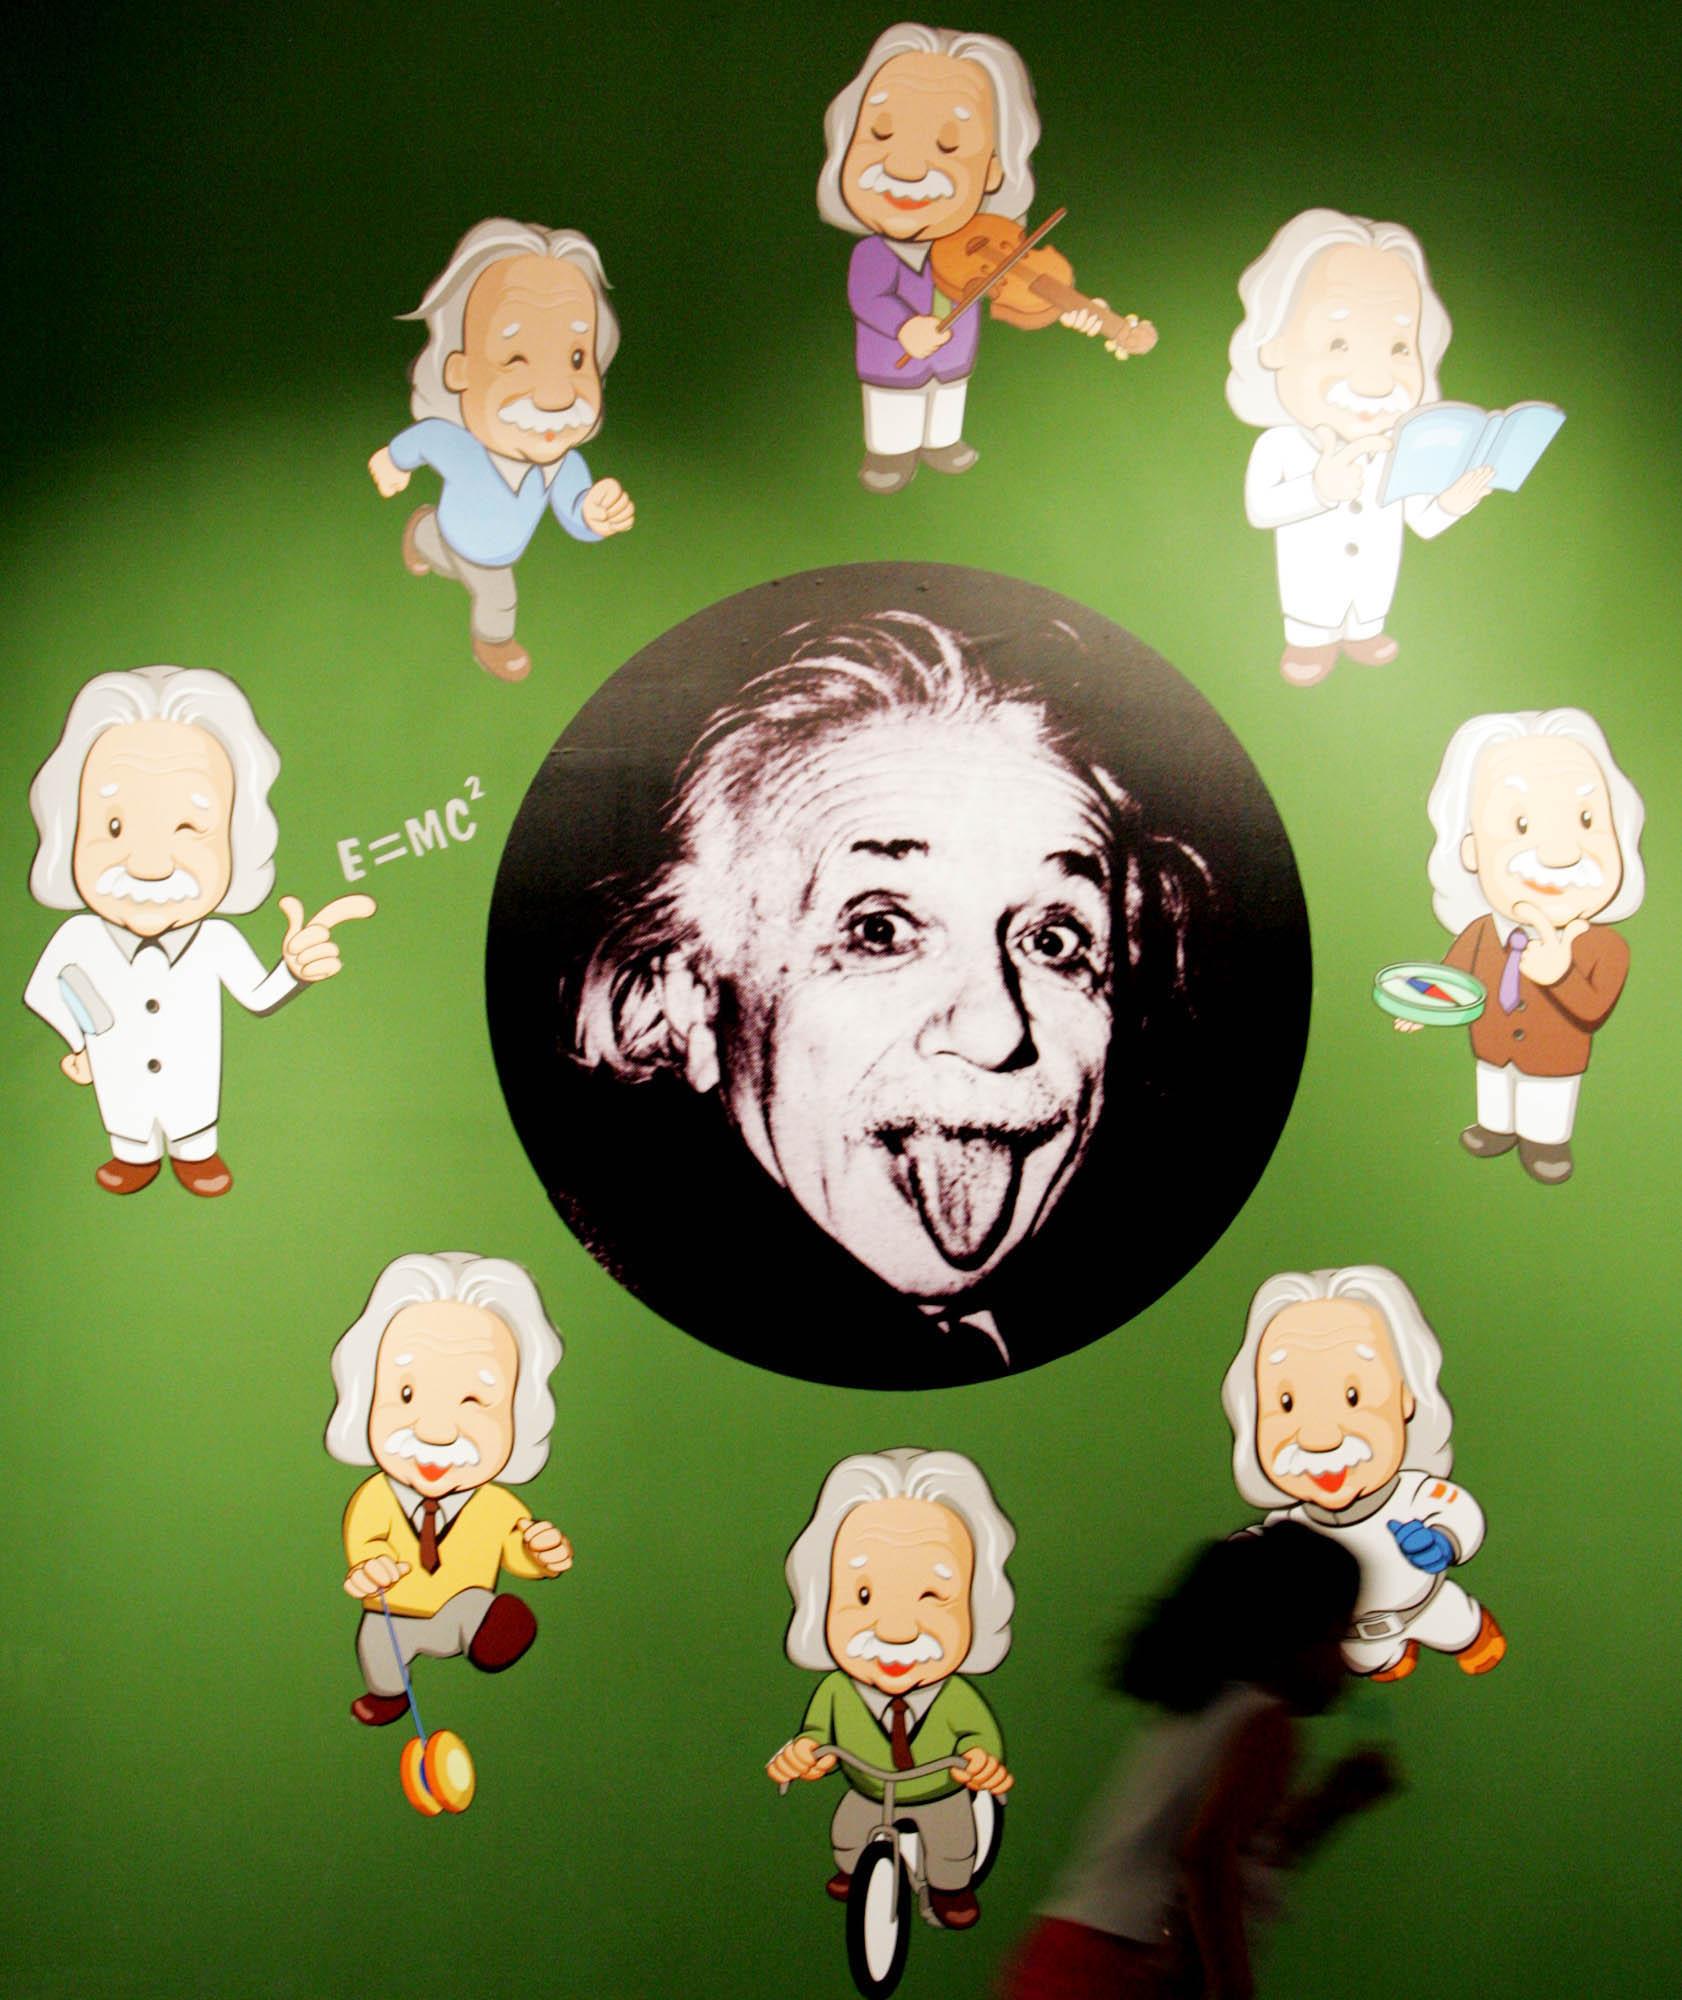 FOTO Te atreves a descifrar el famoso acertijo de Einstein